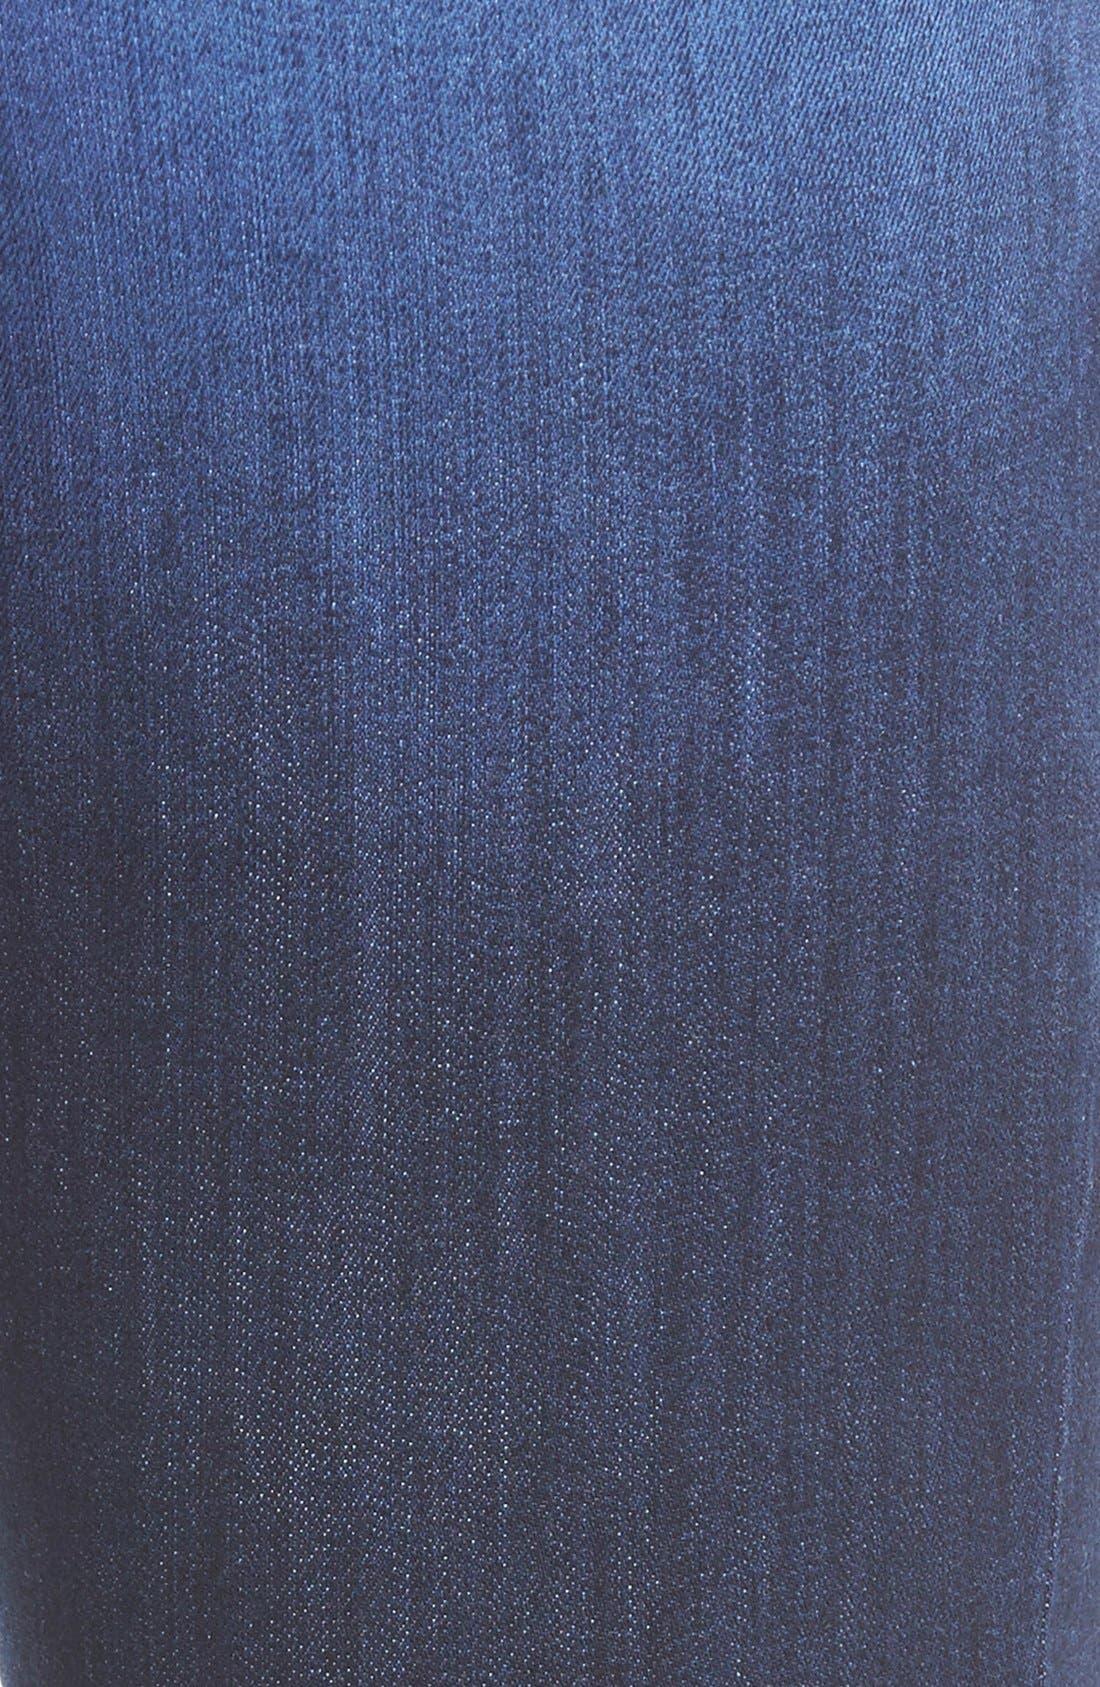 Alternate Image 3  - Articles of Society Red Label 'SoHo' Skinny Jeans (Broadwick)